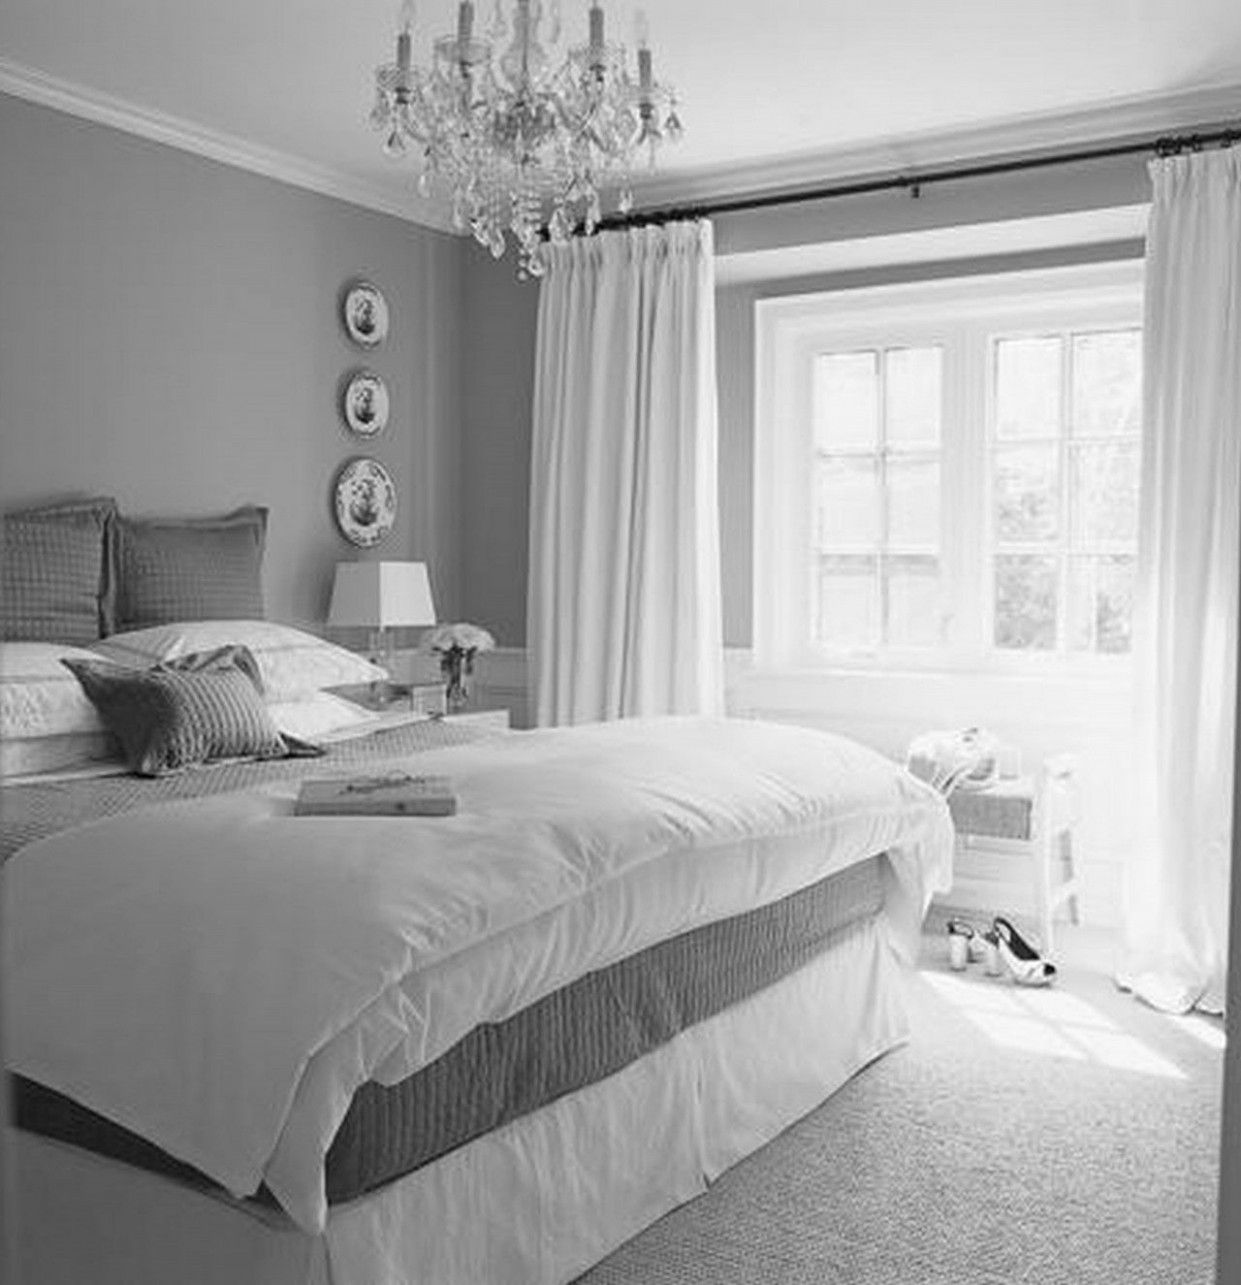 Pin On Home Ideas Grey decor bedroom ideas